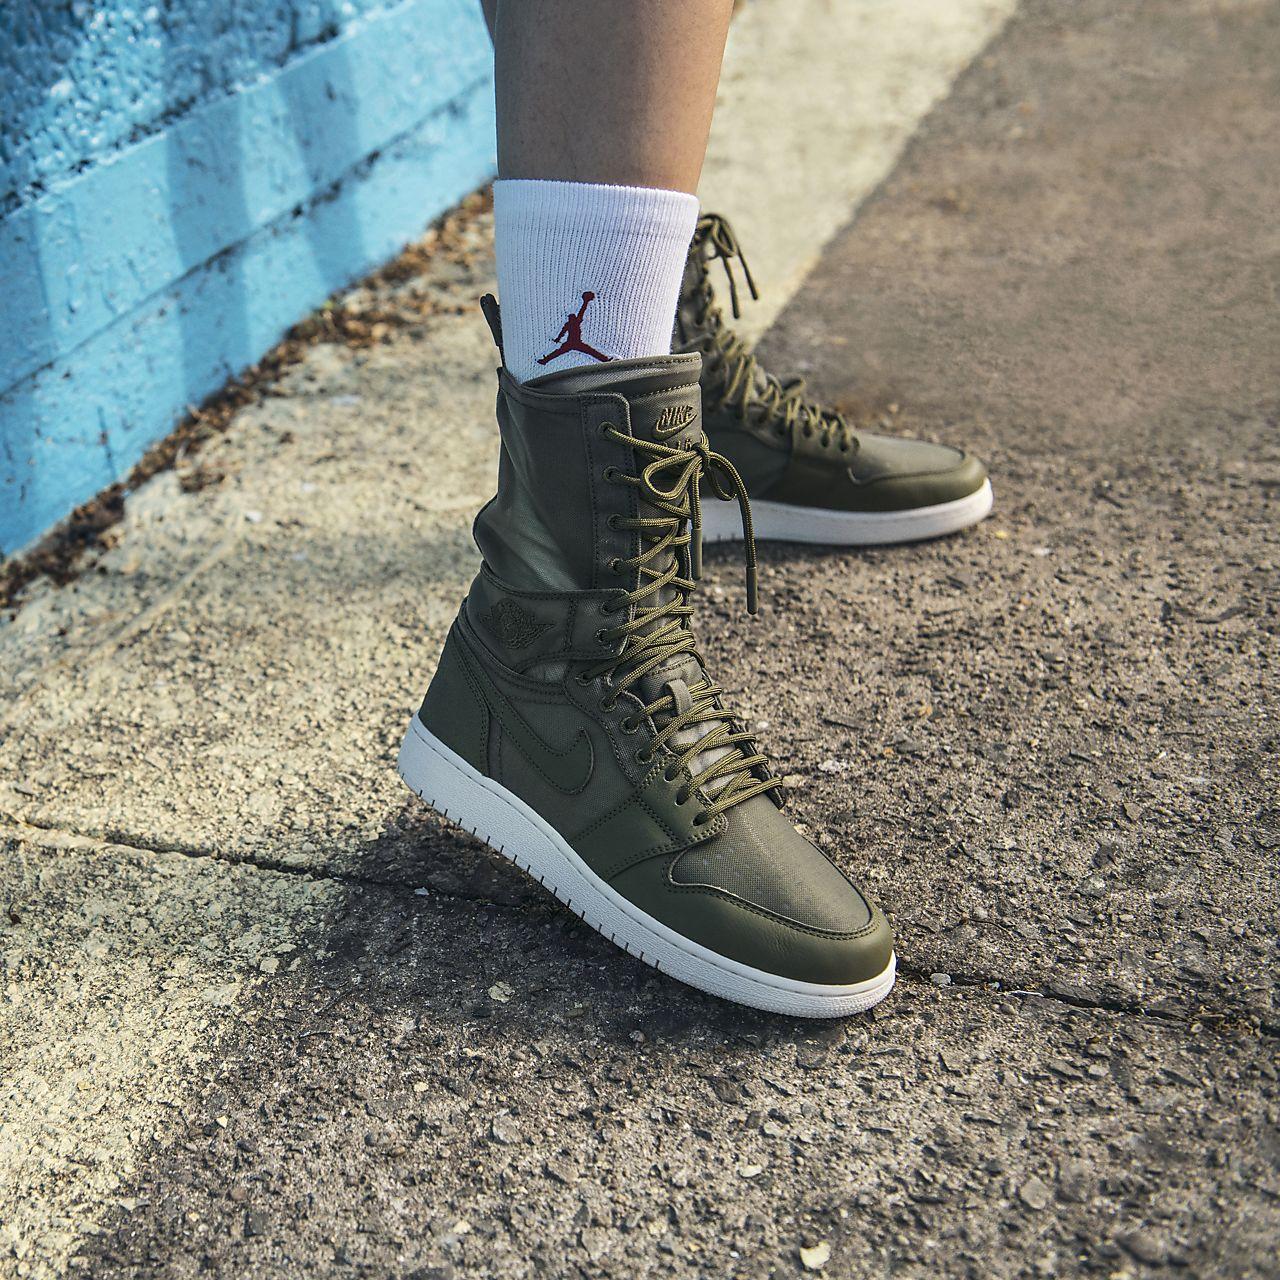 best service 98c97 c3a6d Air Jordan 1 Explorer XX - sko til kvinder. Nike.com DK